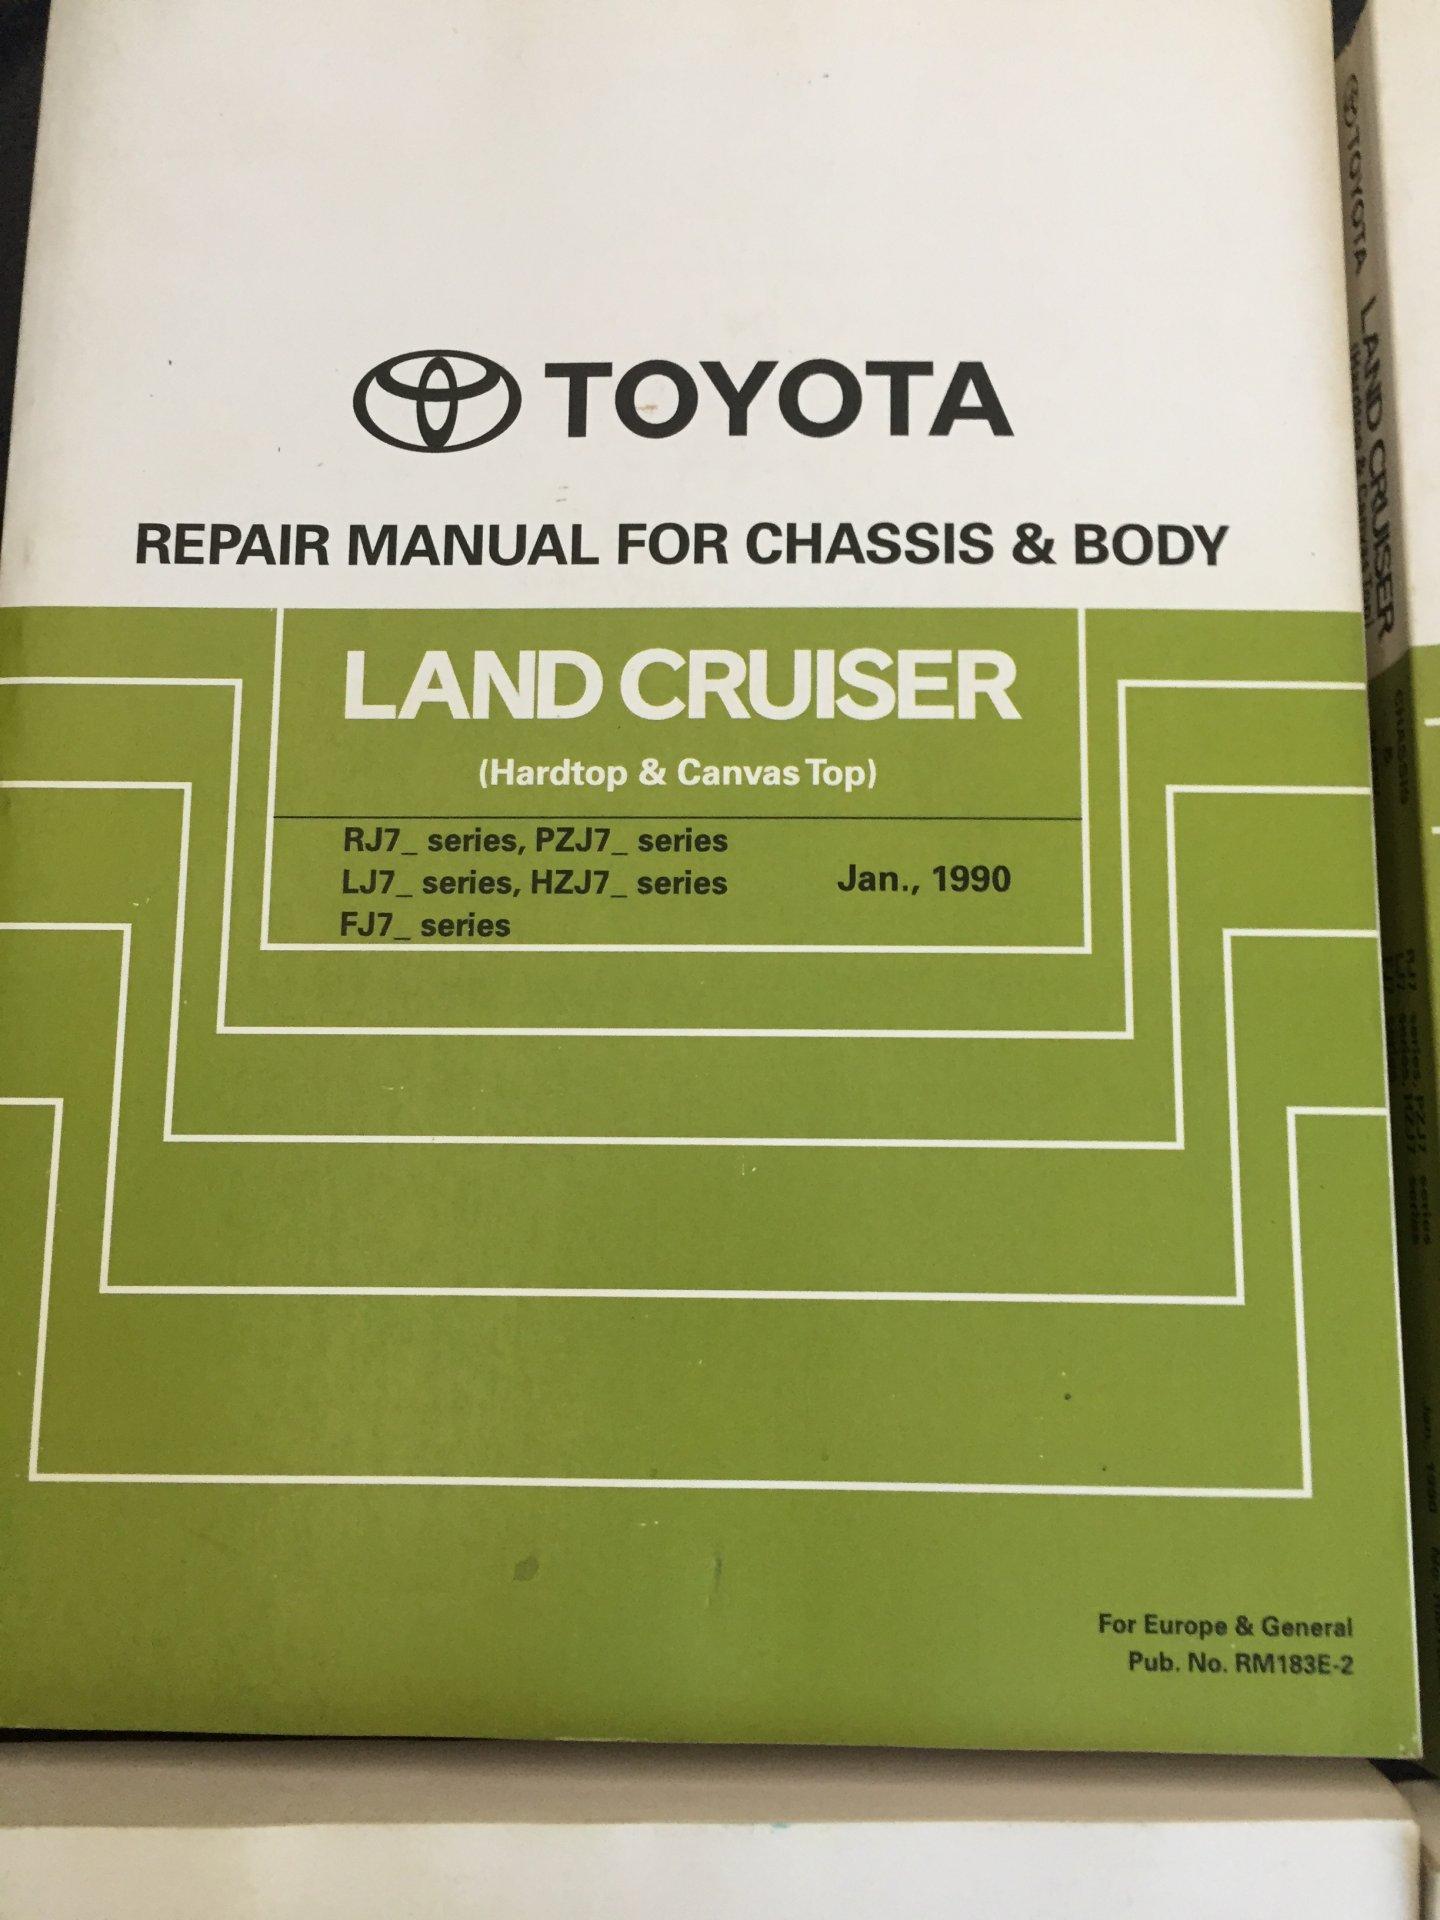 1990 Toyota manuals 001.JPG